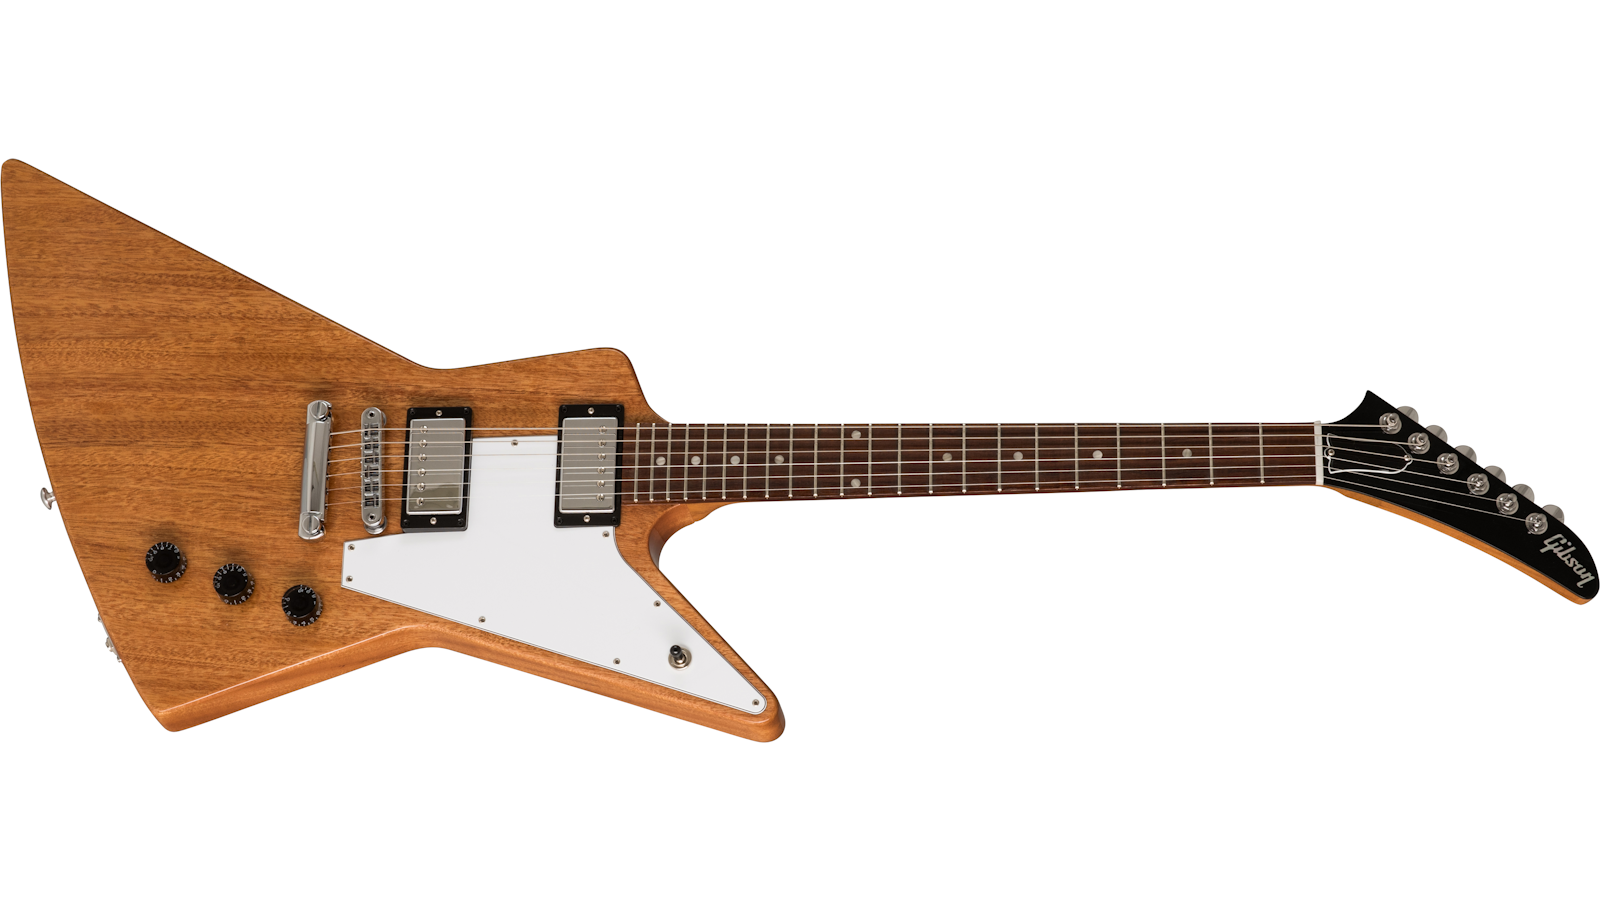 Gibson Guitars Explore Explorer Models 500t Super Ceramic Bridge Humbucker Electric Guitar Pickup